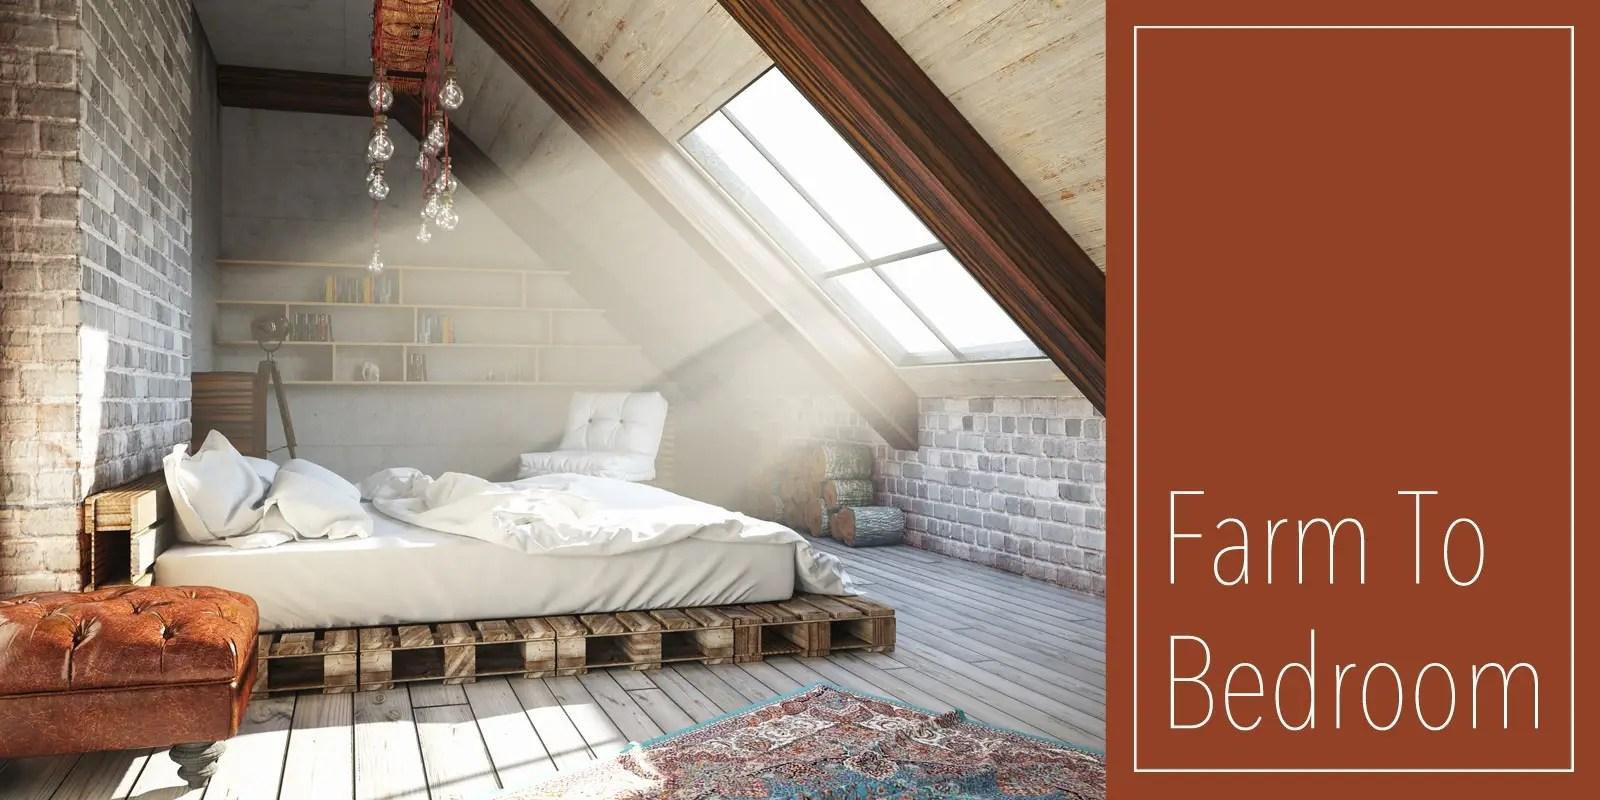 Blog Farm To Bedroom Organic Mattress Movement